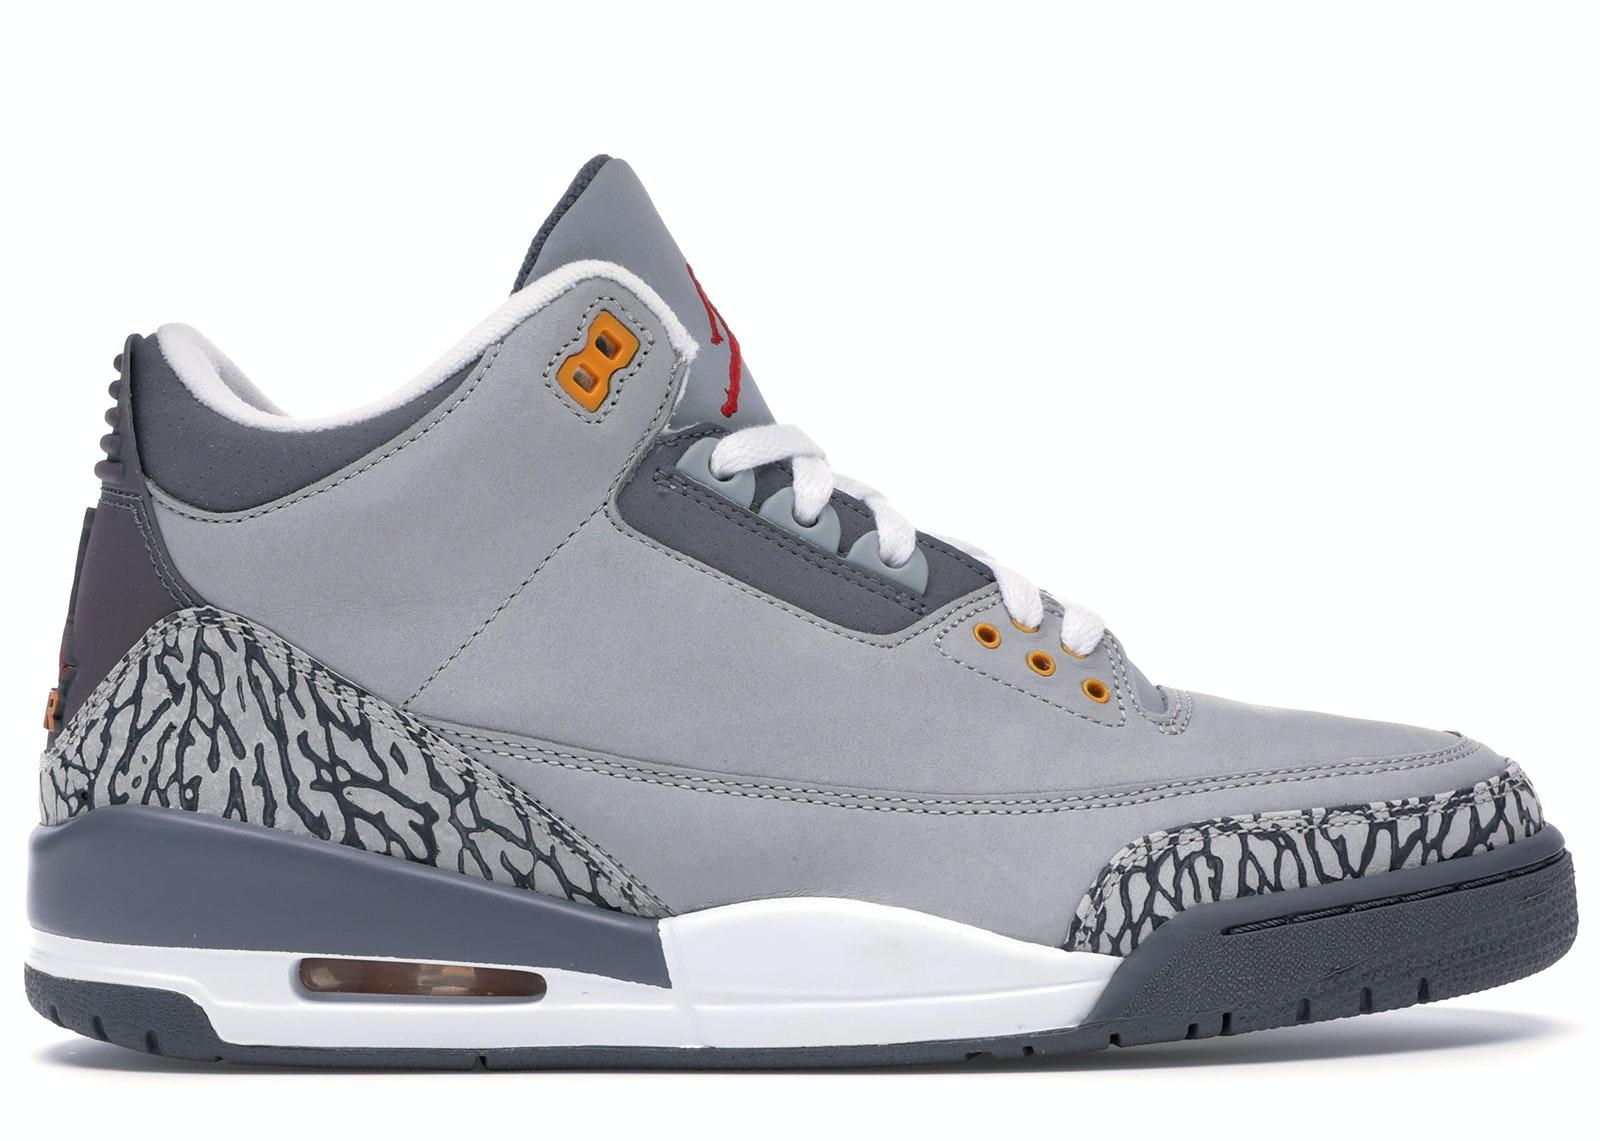 jordan retro 3 grey